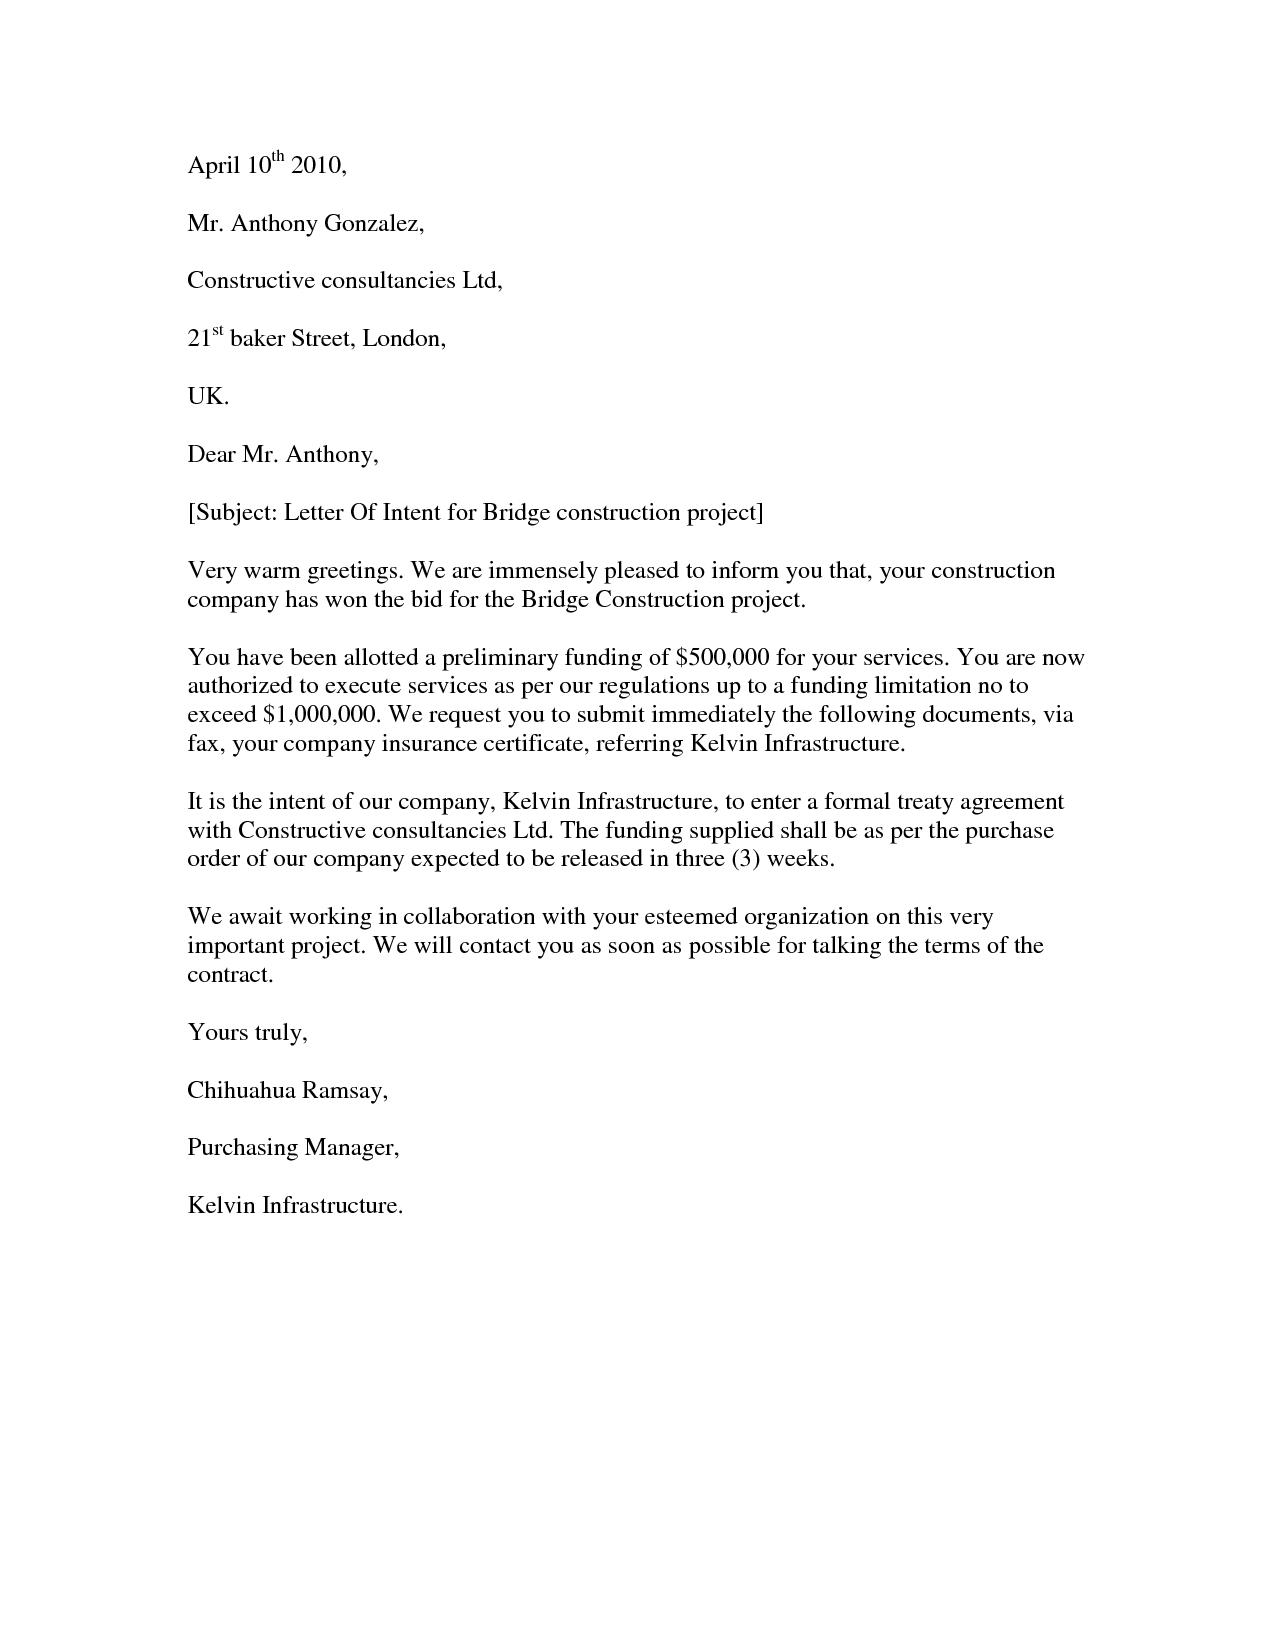 agreement letter sample for building